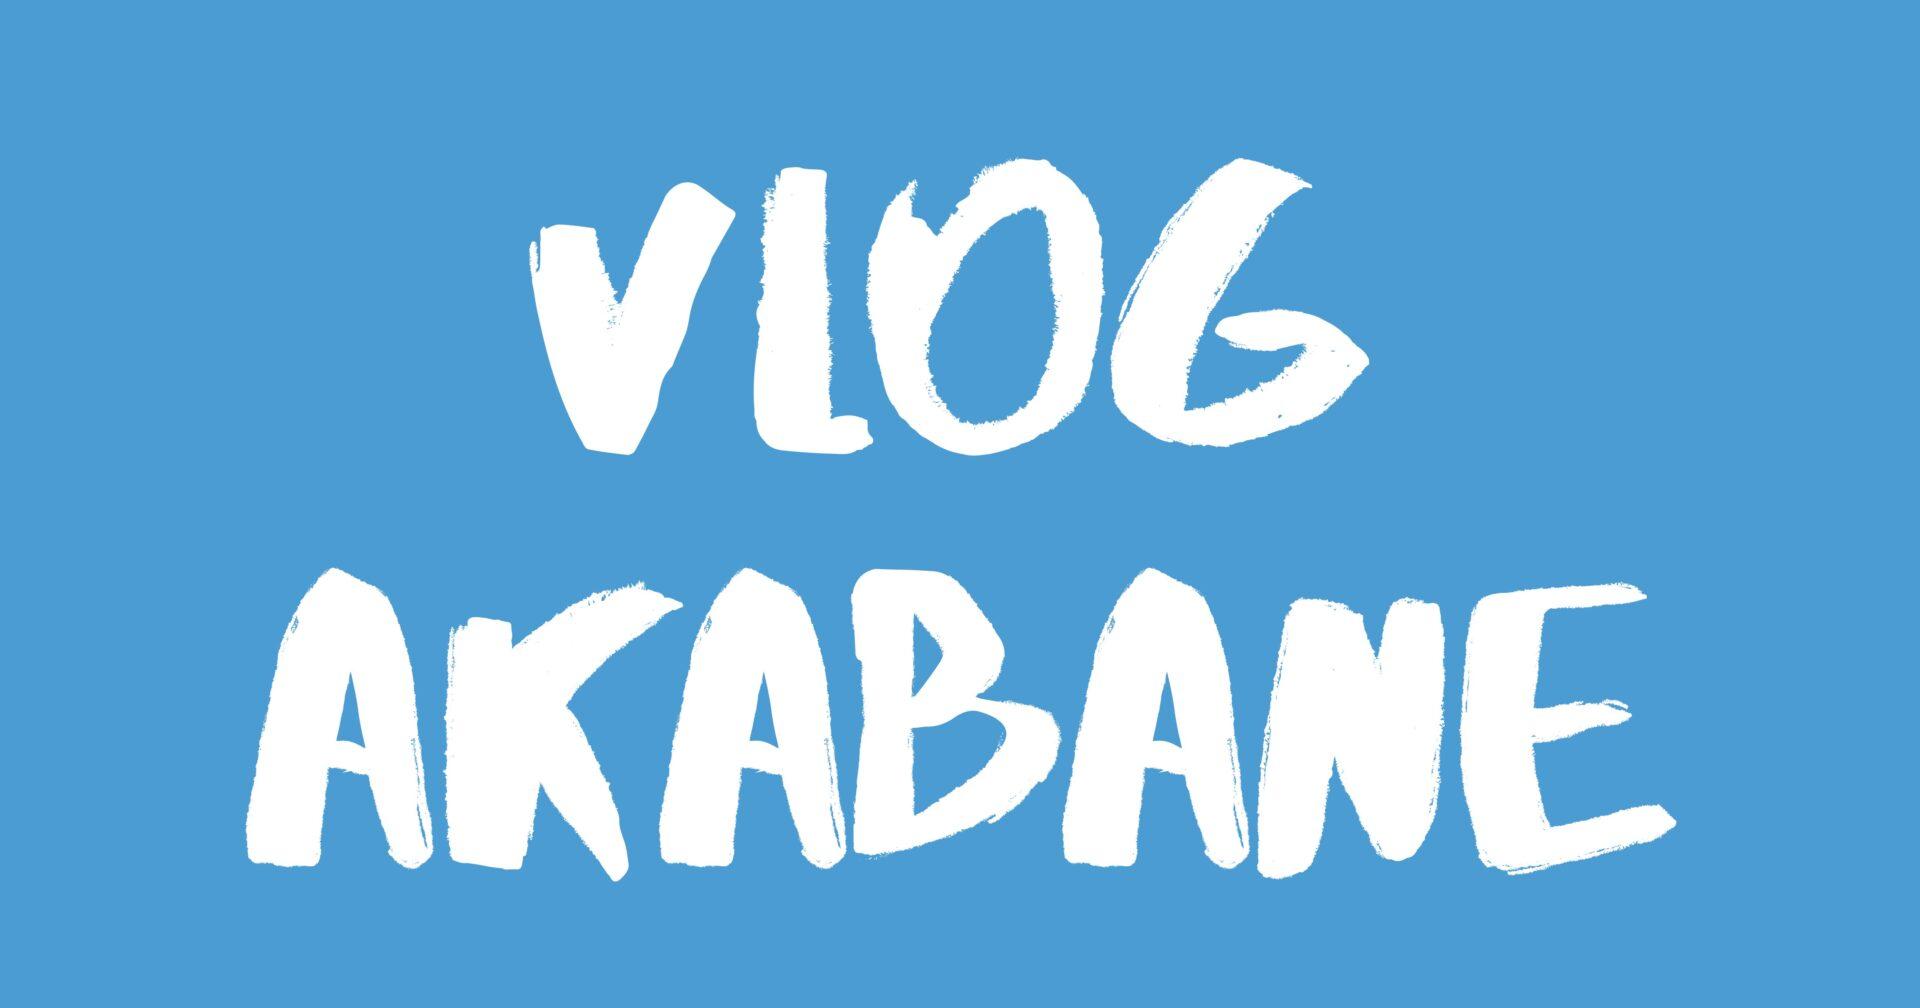 [Vlog] 赤羽 / Akabane